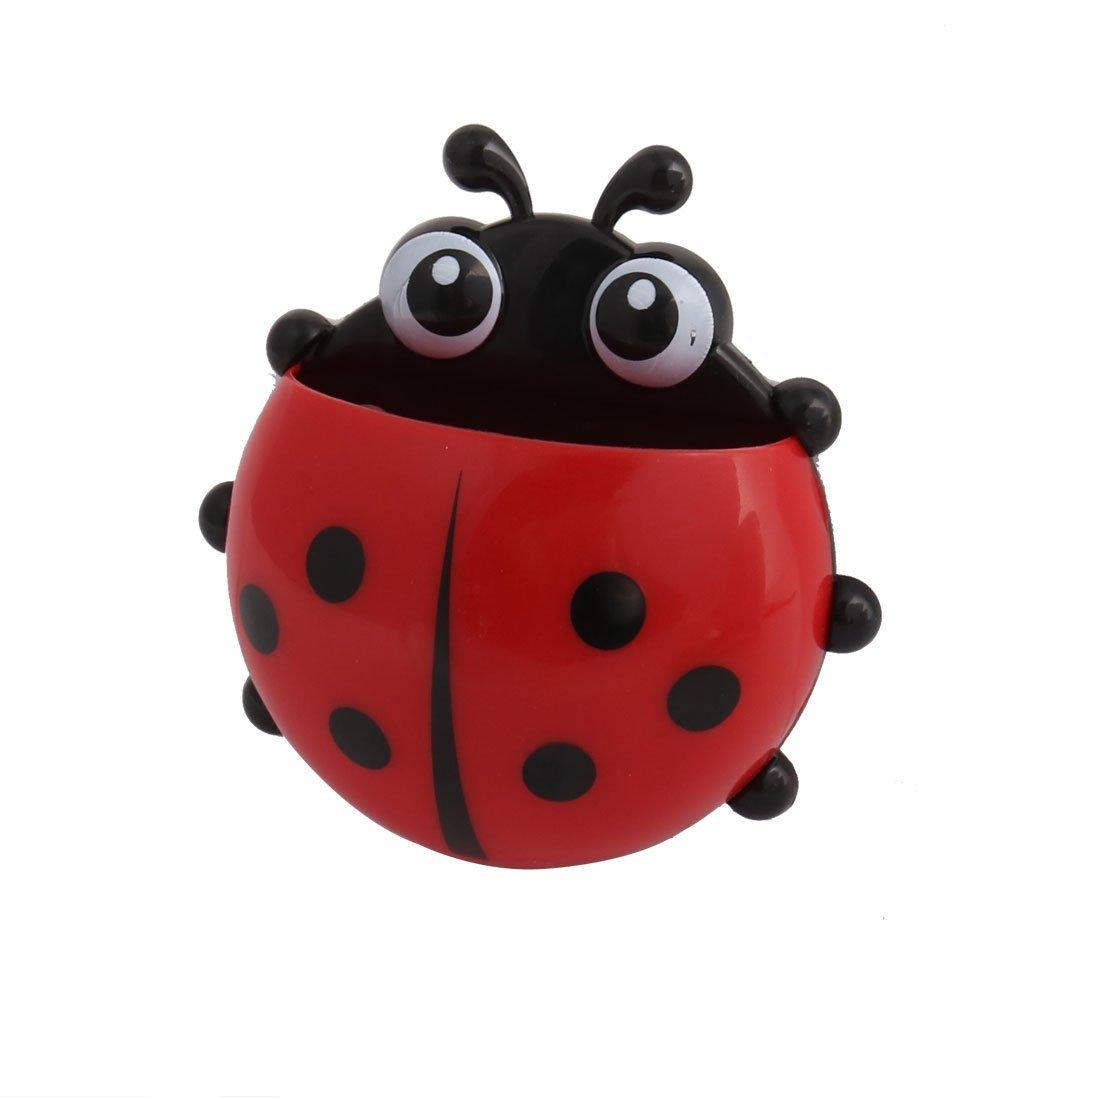 eDealMax plástico de baño Ladybird Patrón ventosa pared del jabón cepillo de dientes titular Organizador Rojo - - Amazon.com